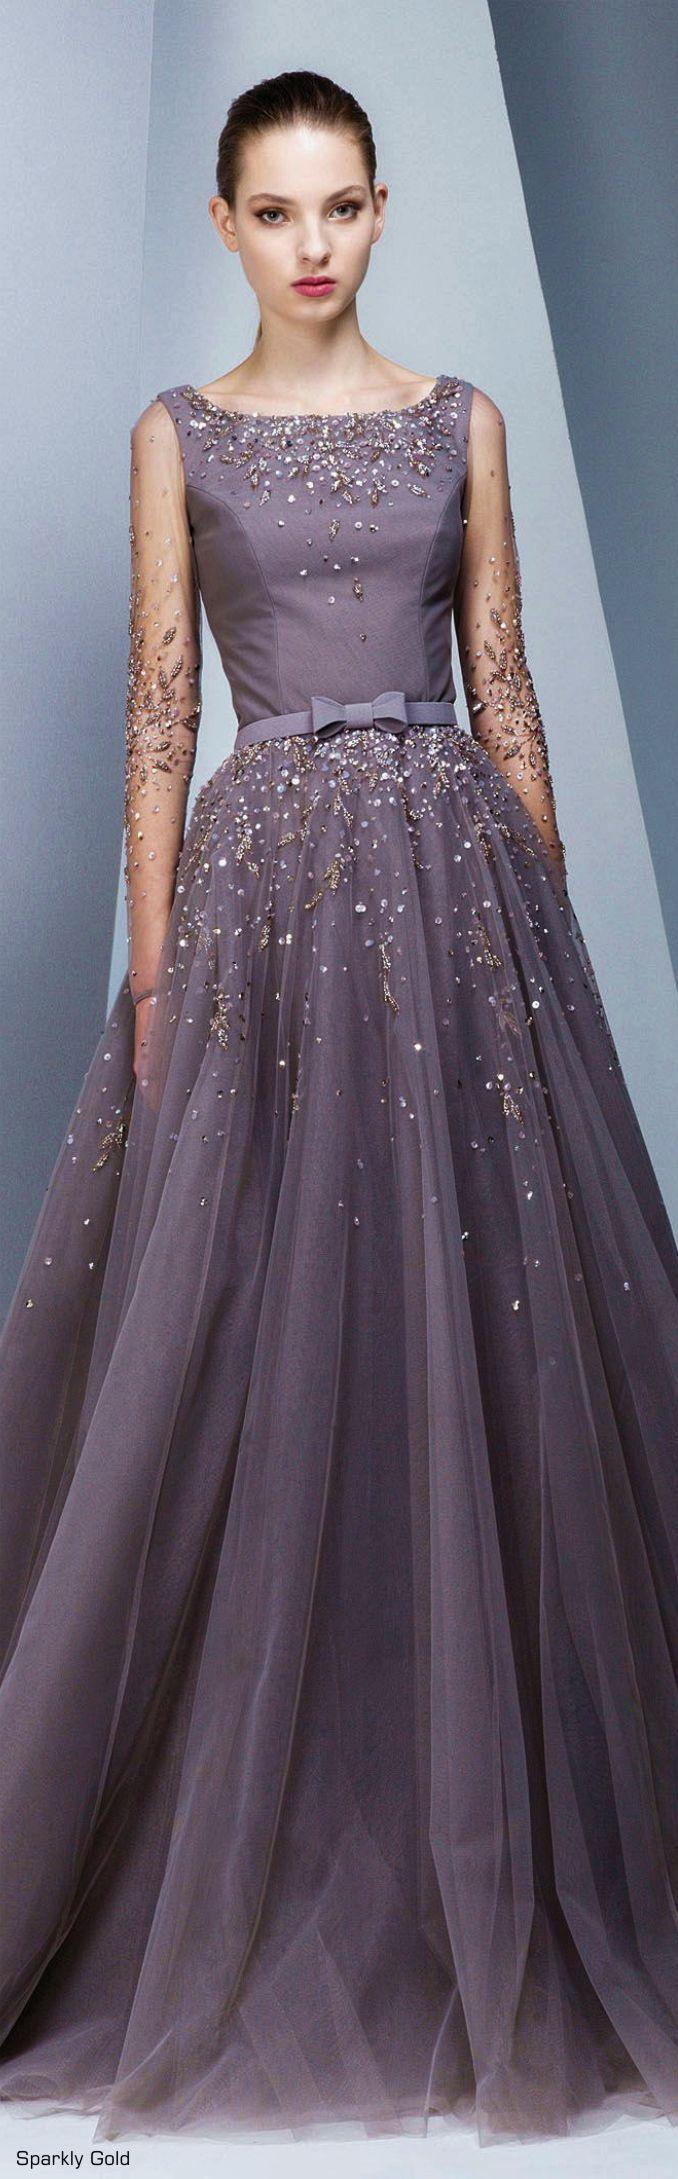 #formaldresseshttp://www.dariuscordell.com/featured/long-sleeve-evening-dresses-ball-gowns/ jaglady -- love the sleeves